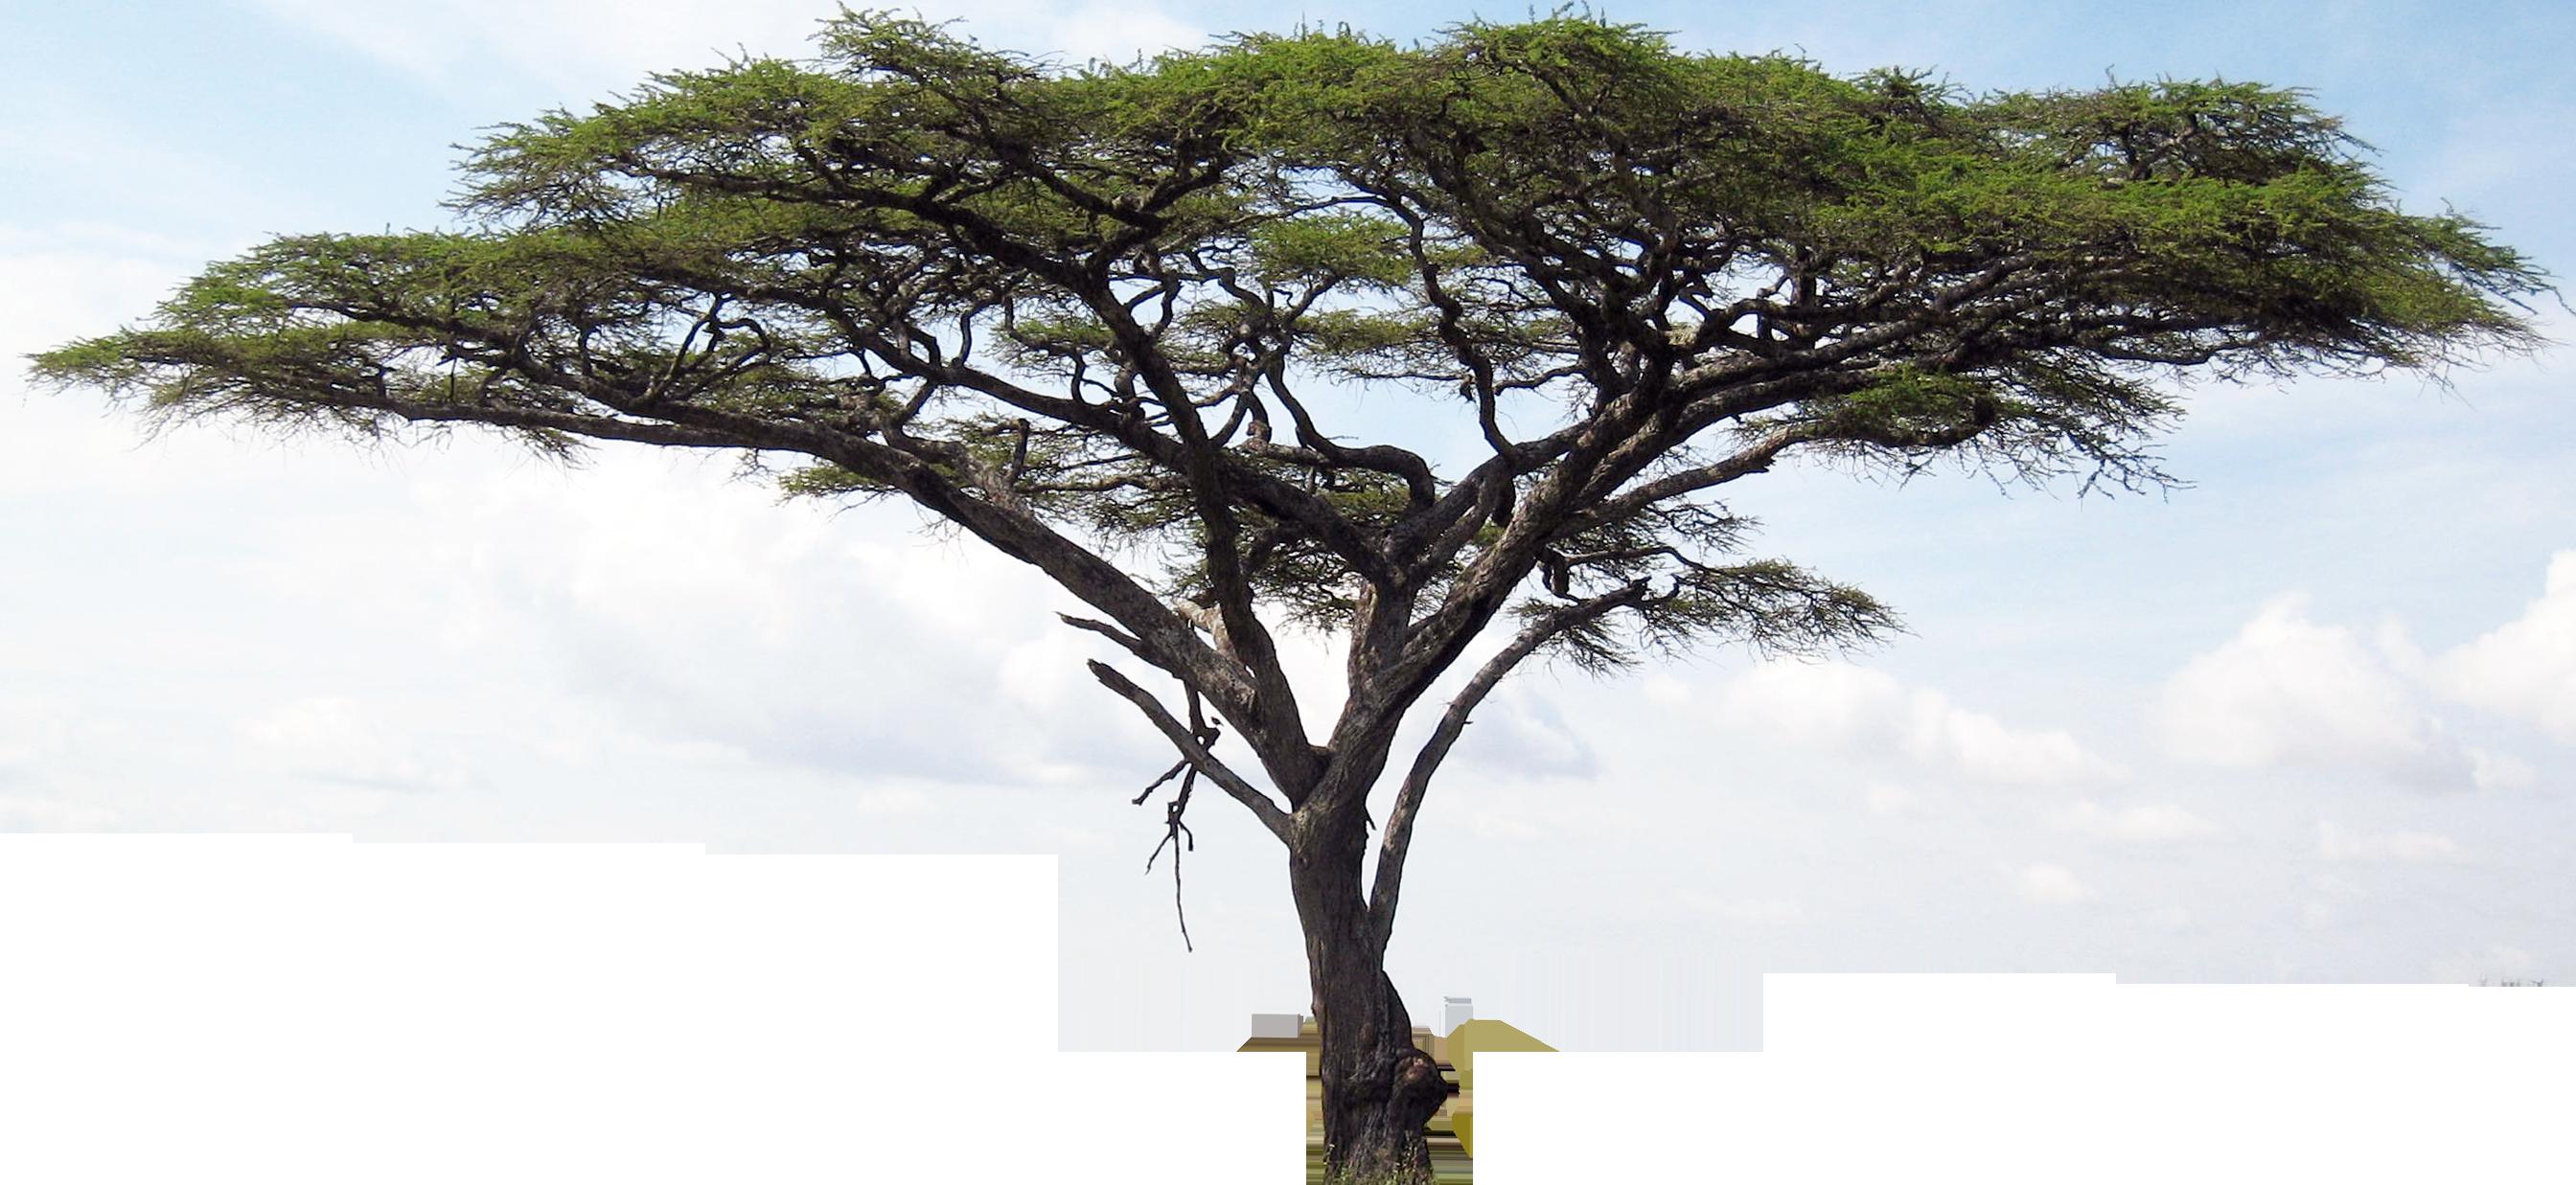 Savanna tree clipart graphic black and white library acacia tree clipart accacia 2 - Clip Art. Net graphic black and white library